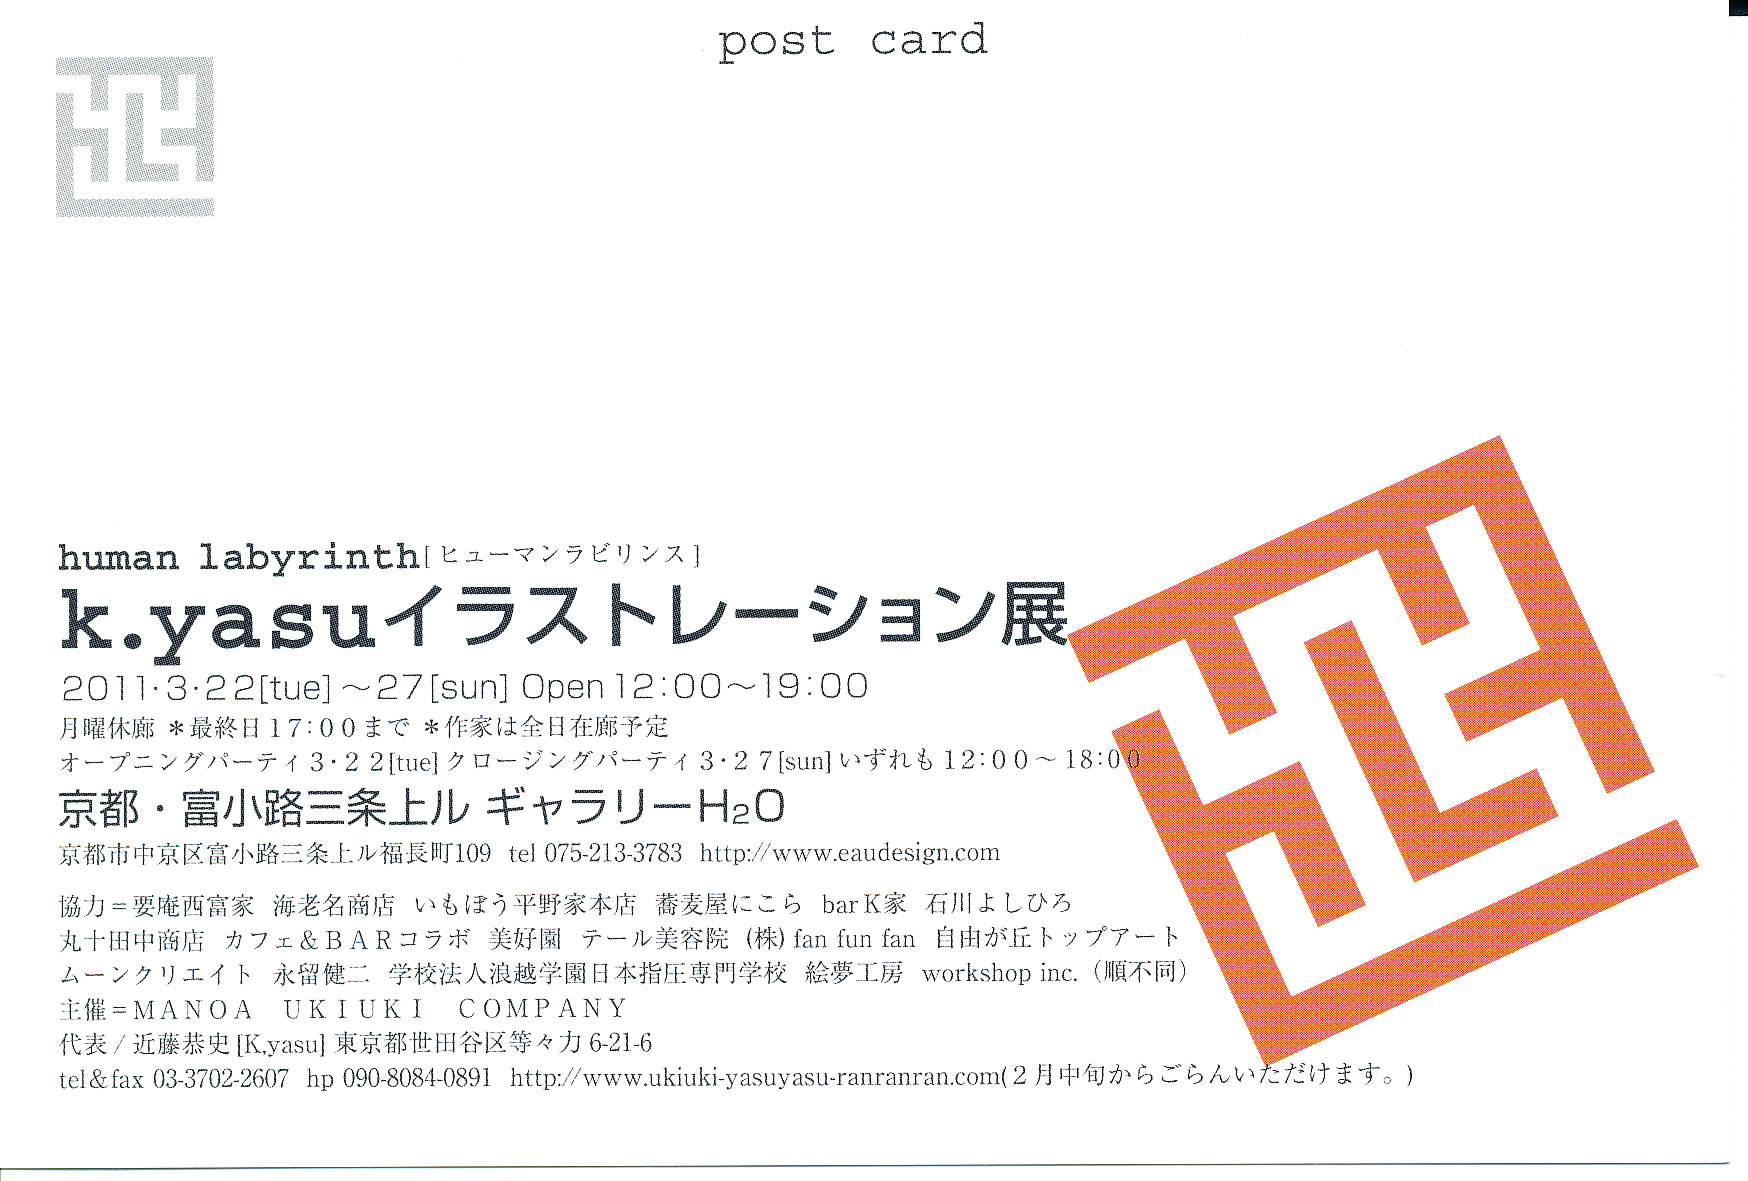 k.yasu イラストレーション展_a0160153_23502751.jpg